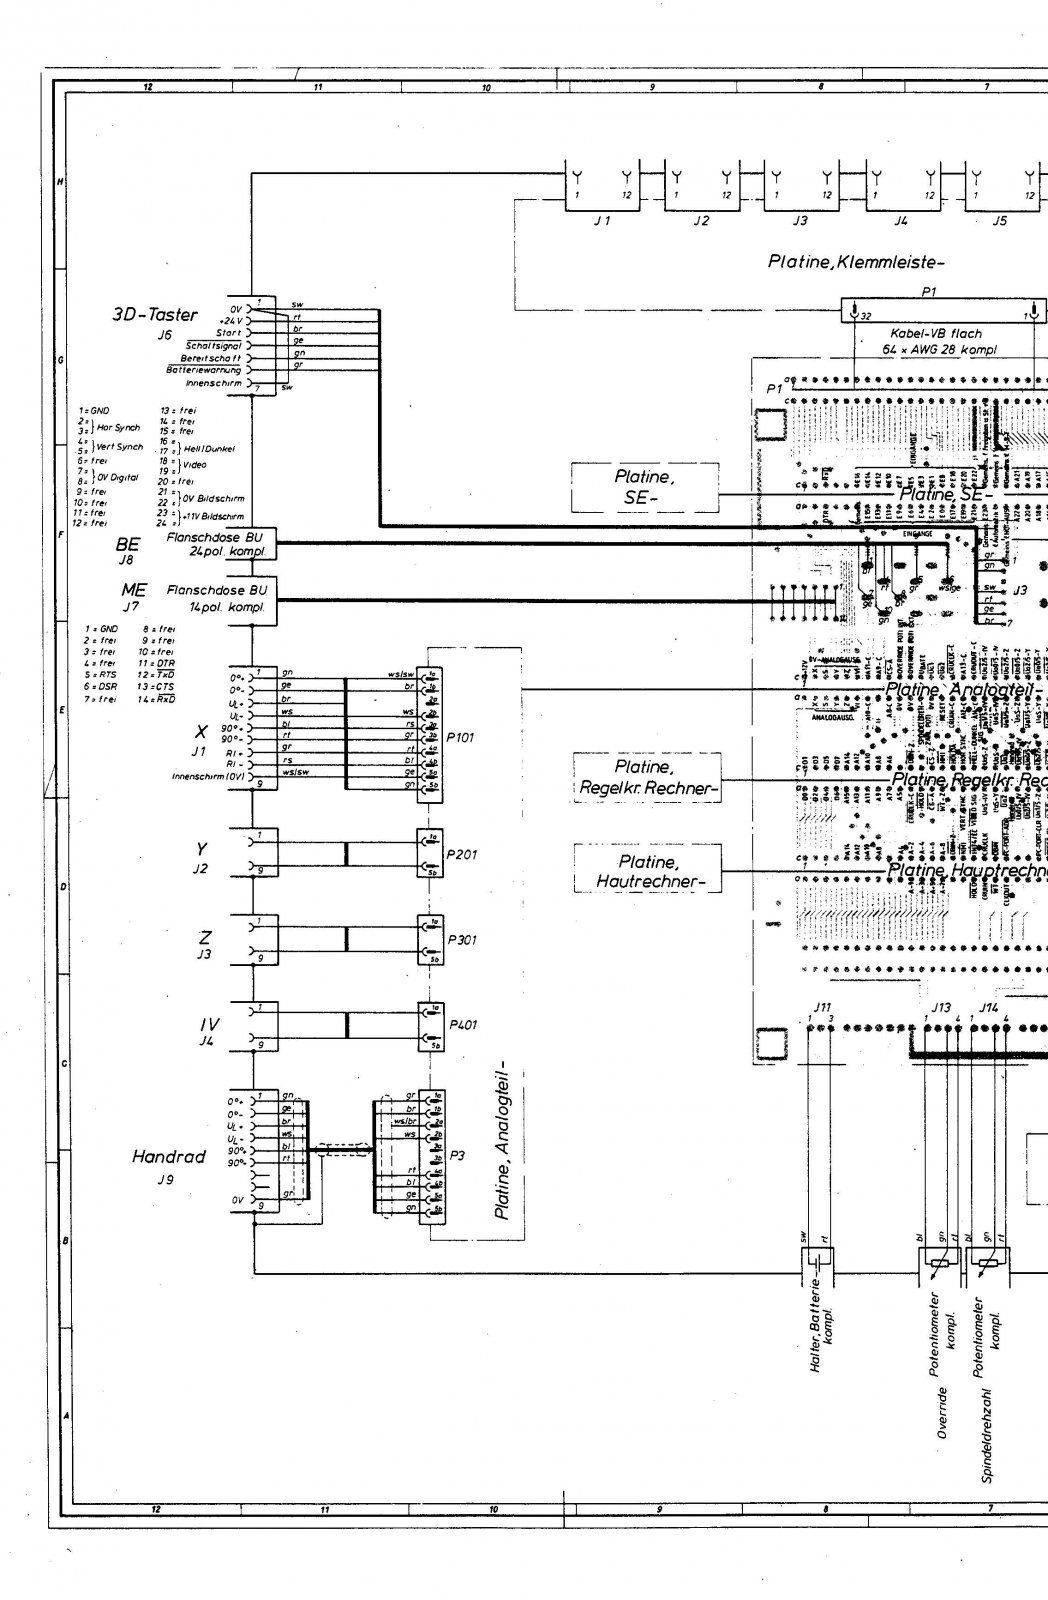 tnc 151_1_Page_89.jpg